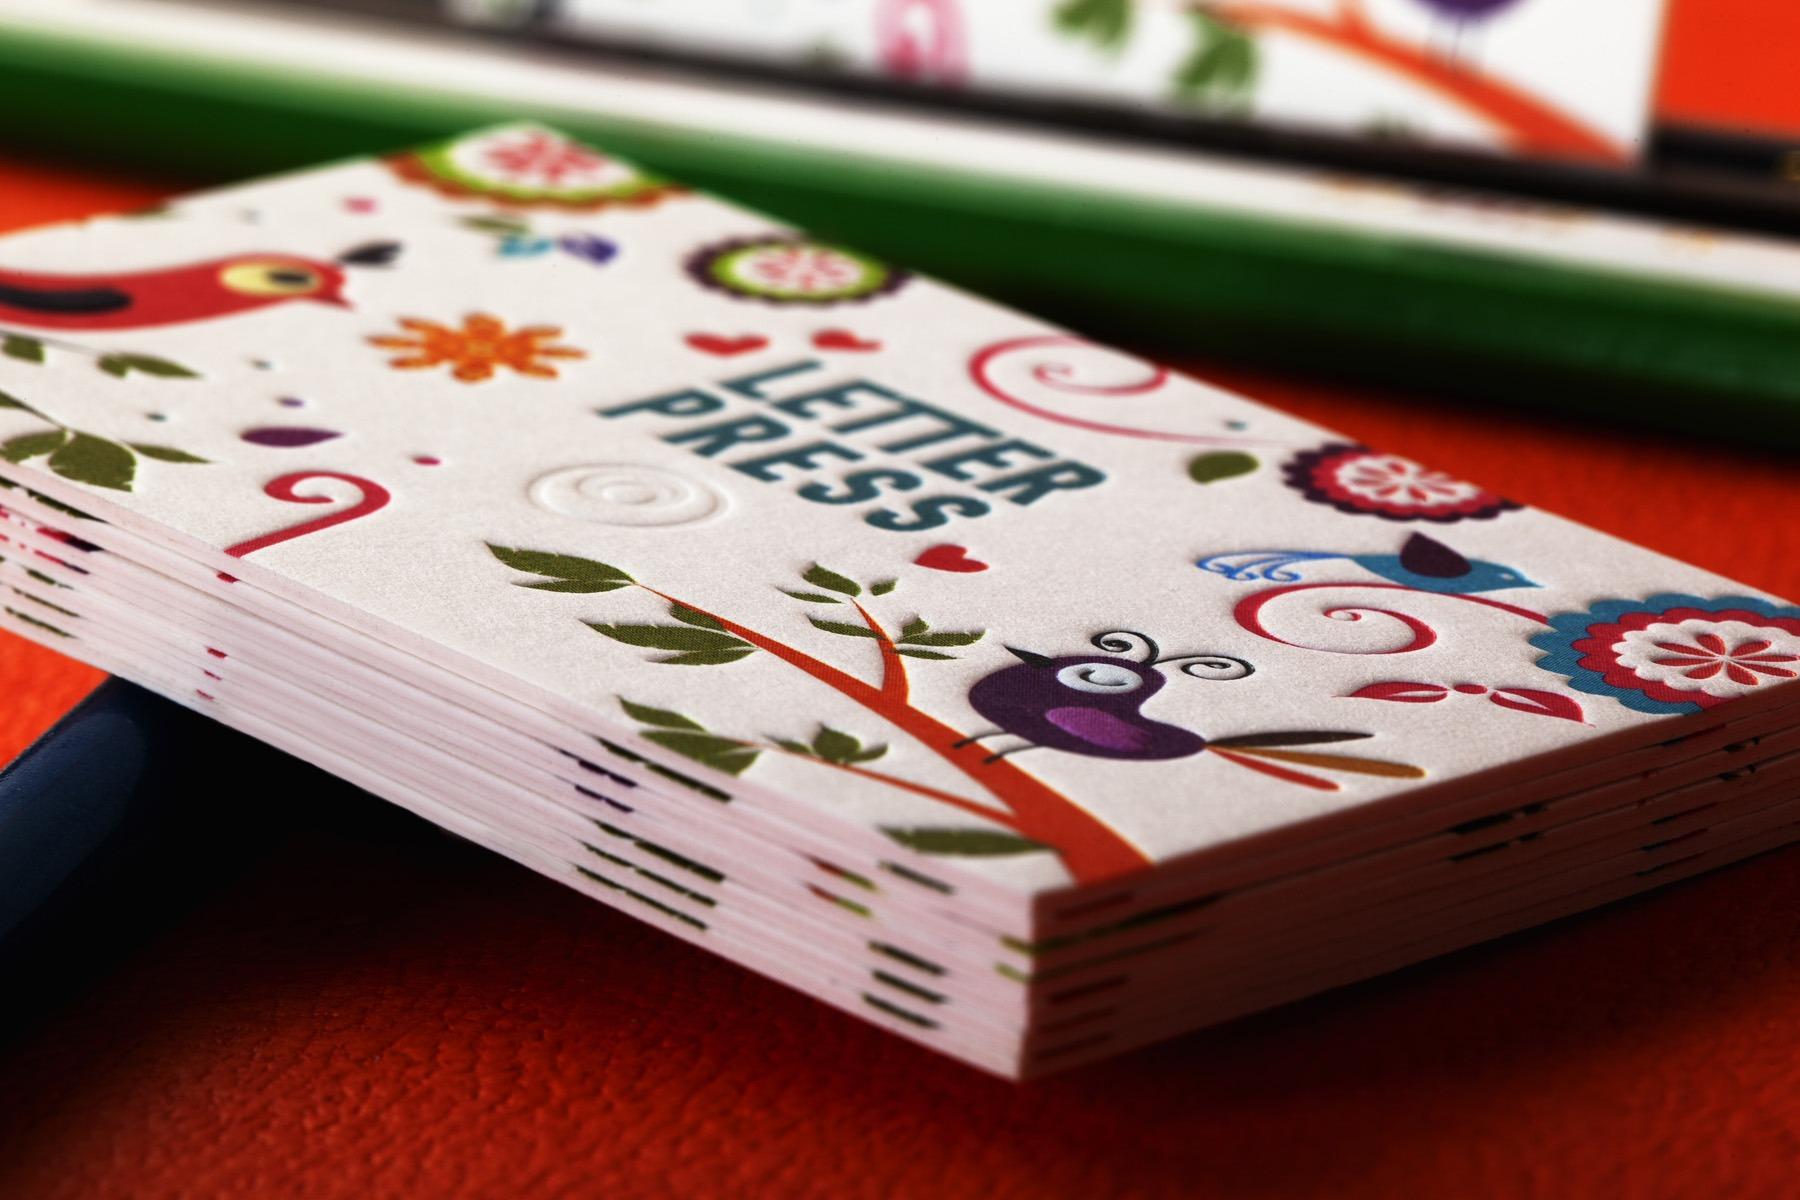 offset εκτύπωση κάρτας σε ειδικό χαρτί